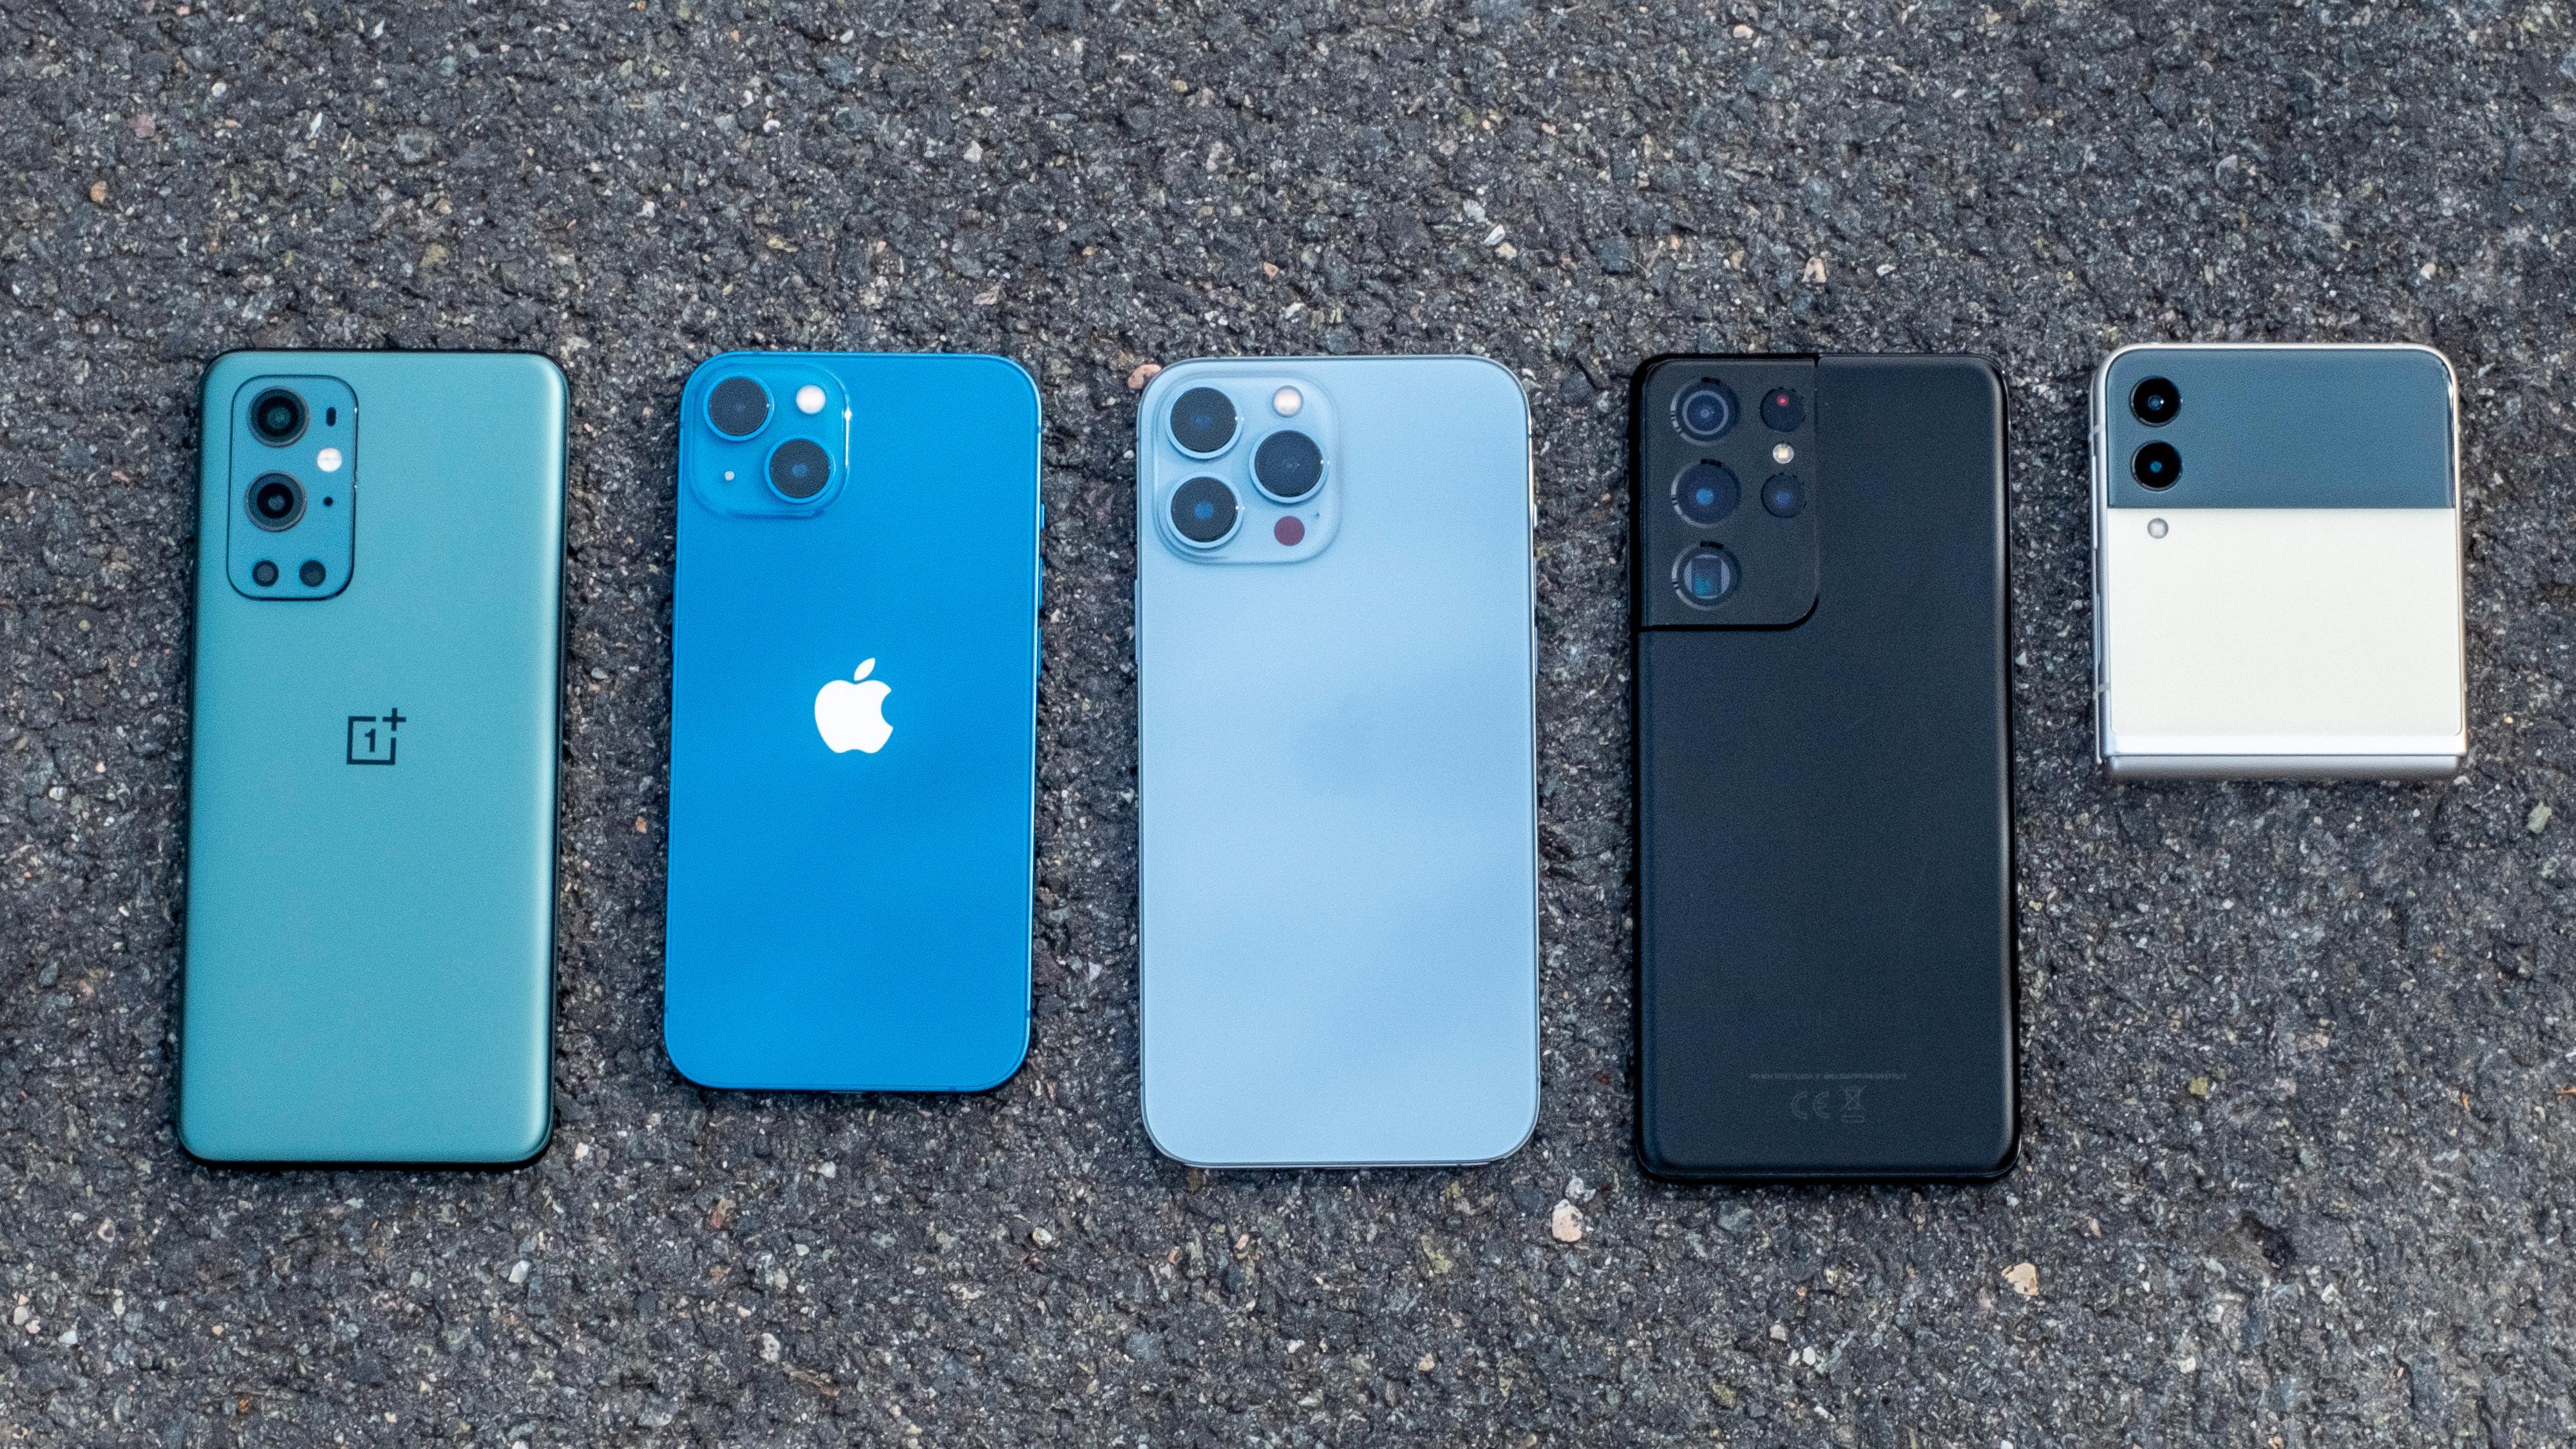 Fra venstre; OnePlus 9 Pro, iPhone 13, iPhone 13 Pro Max, Samsung Galaxy S21 Ultra og Samsung Galaxy Z Flip 3.